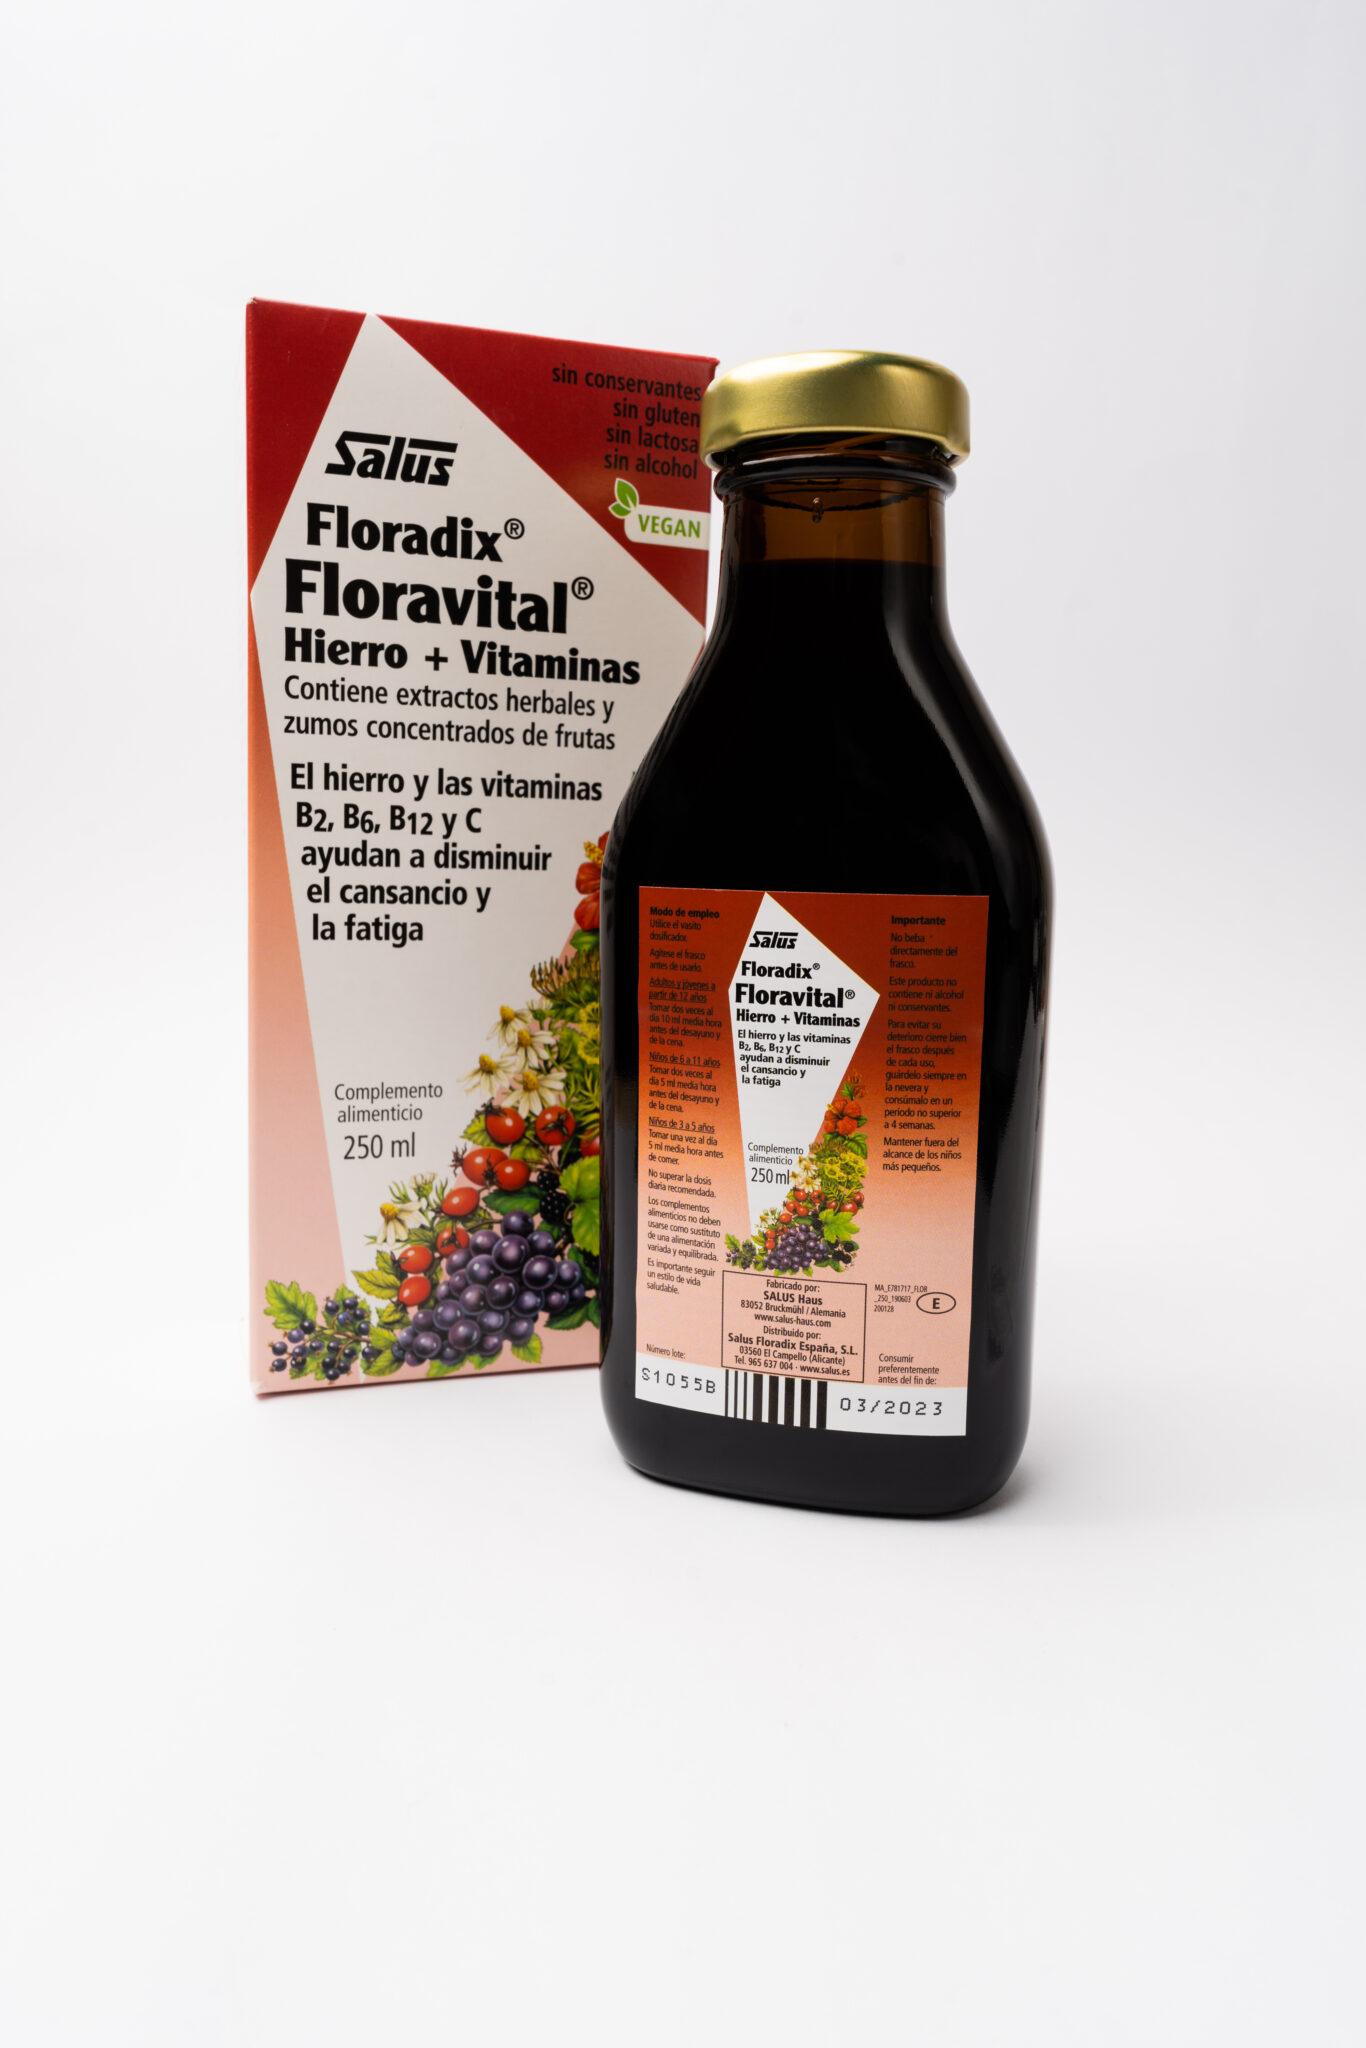 Floradix Floravital Suplemento Nutricional